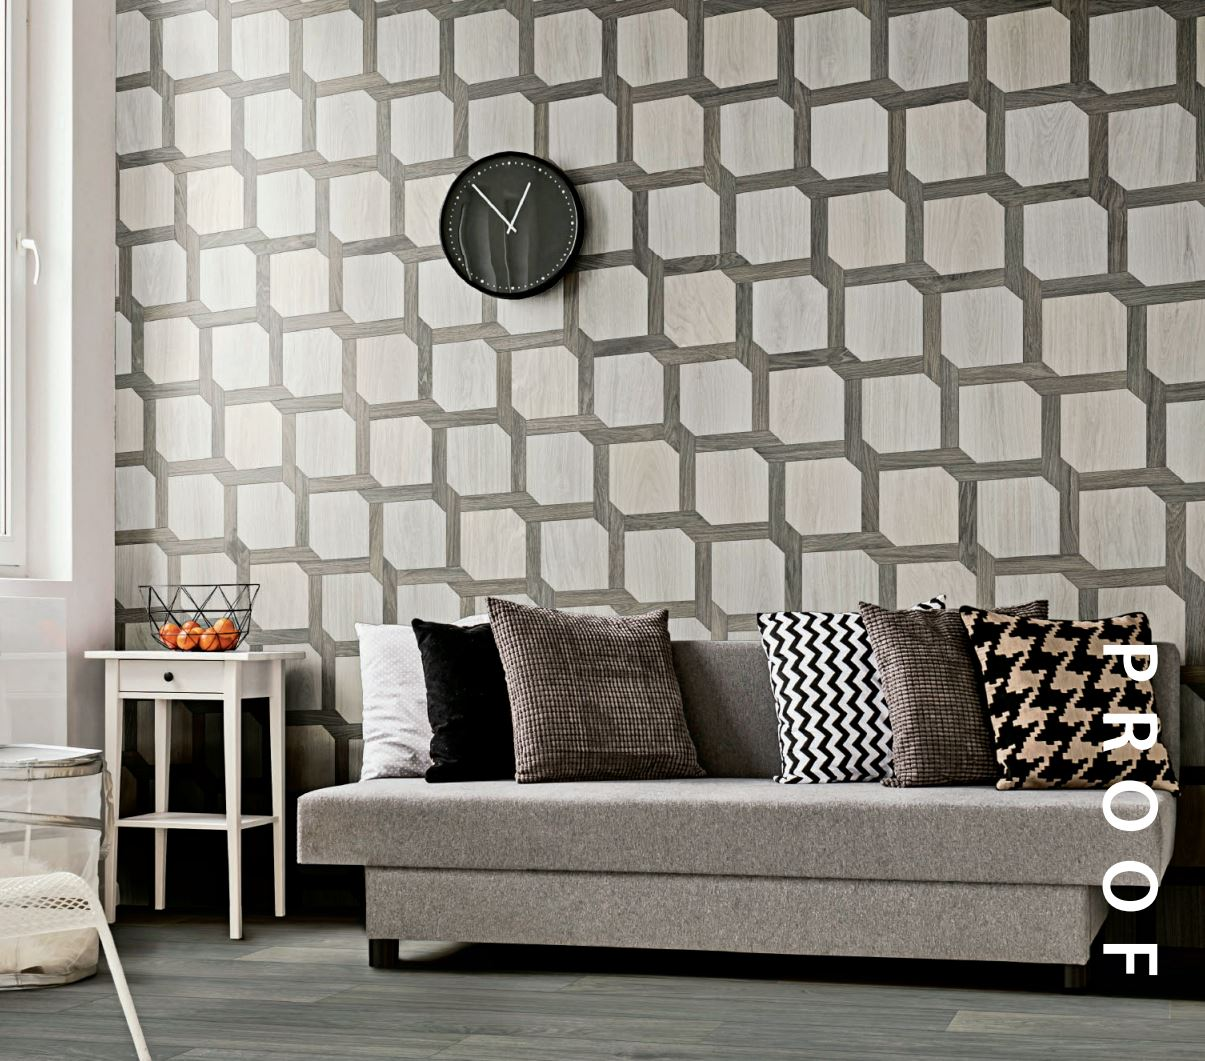 Twist Mosaic Shown on Wall